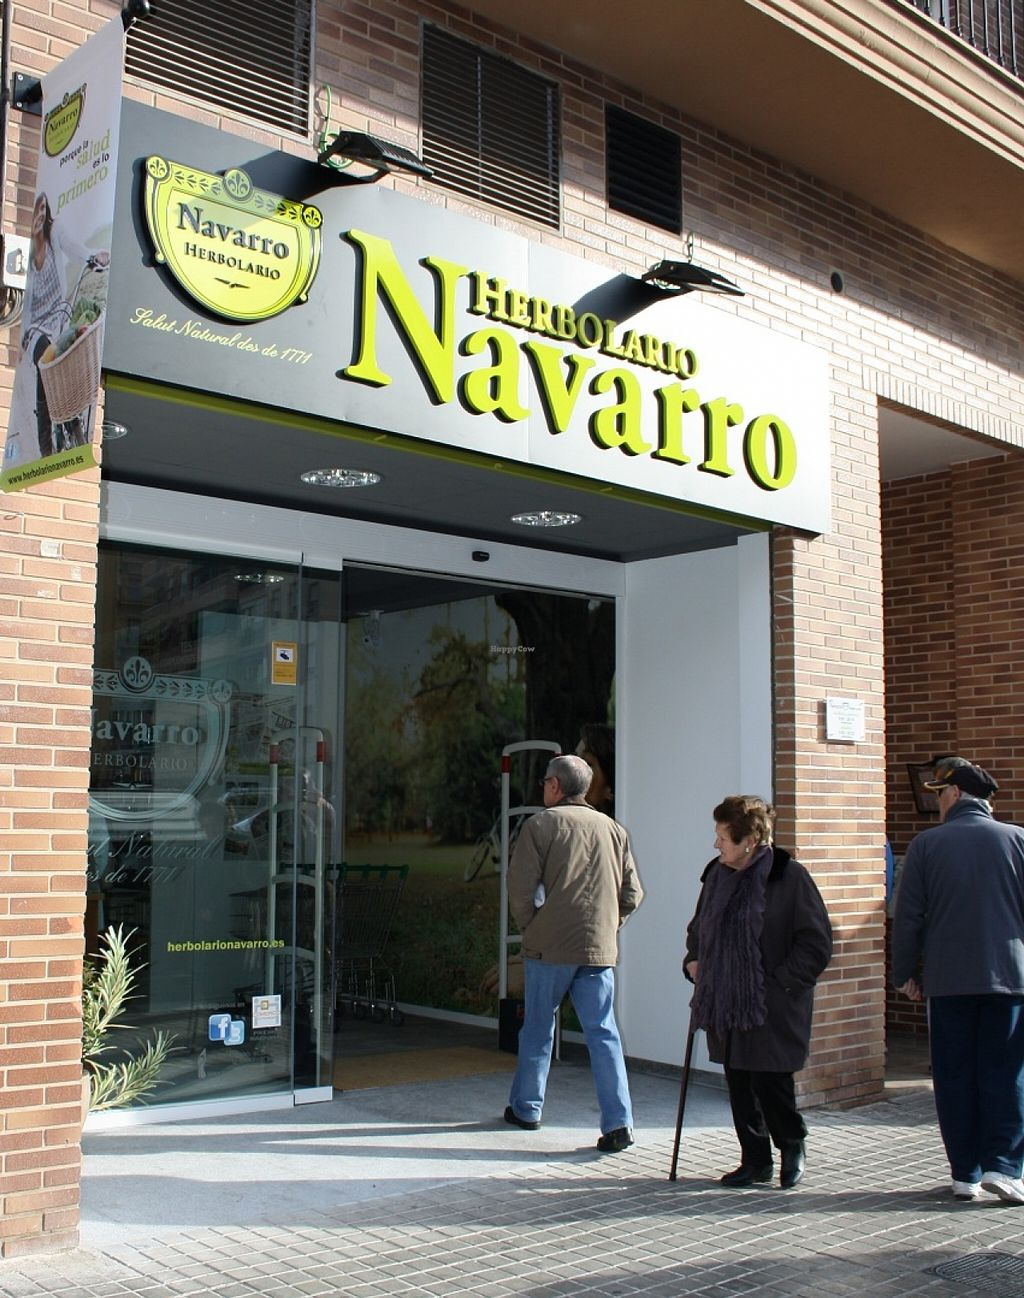 "Photo of Herbolario Navarro  by <a href=""/members/profile/HerbolarioNavarro"">HerbolarioNavarro</a> <br/>Fachada Herbolario Navarro Mislata <br/> November 9, 2015  - <a href='/contact/abuse/image/65441/124409'>Report</a>"